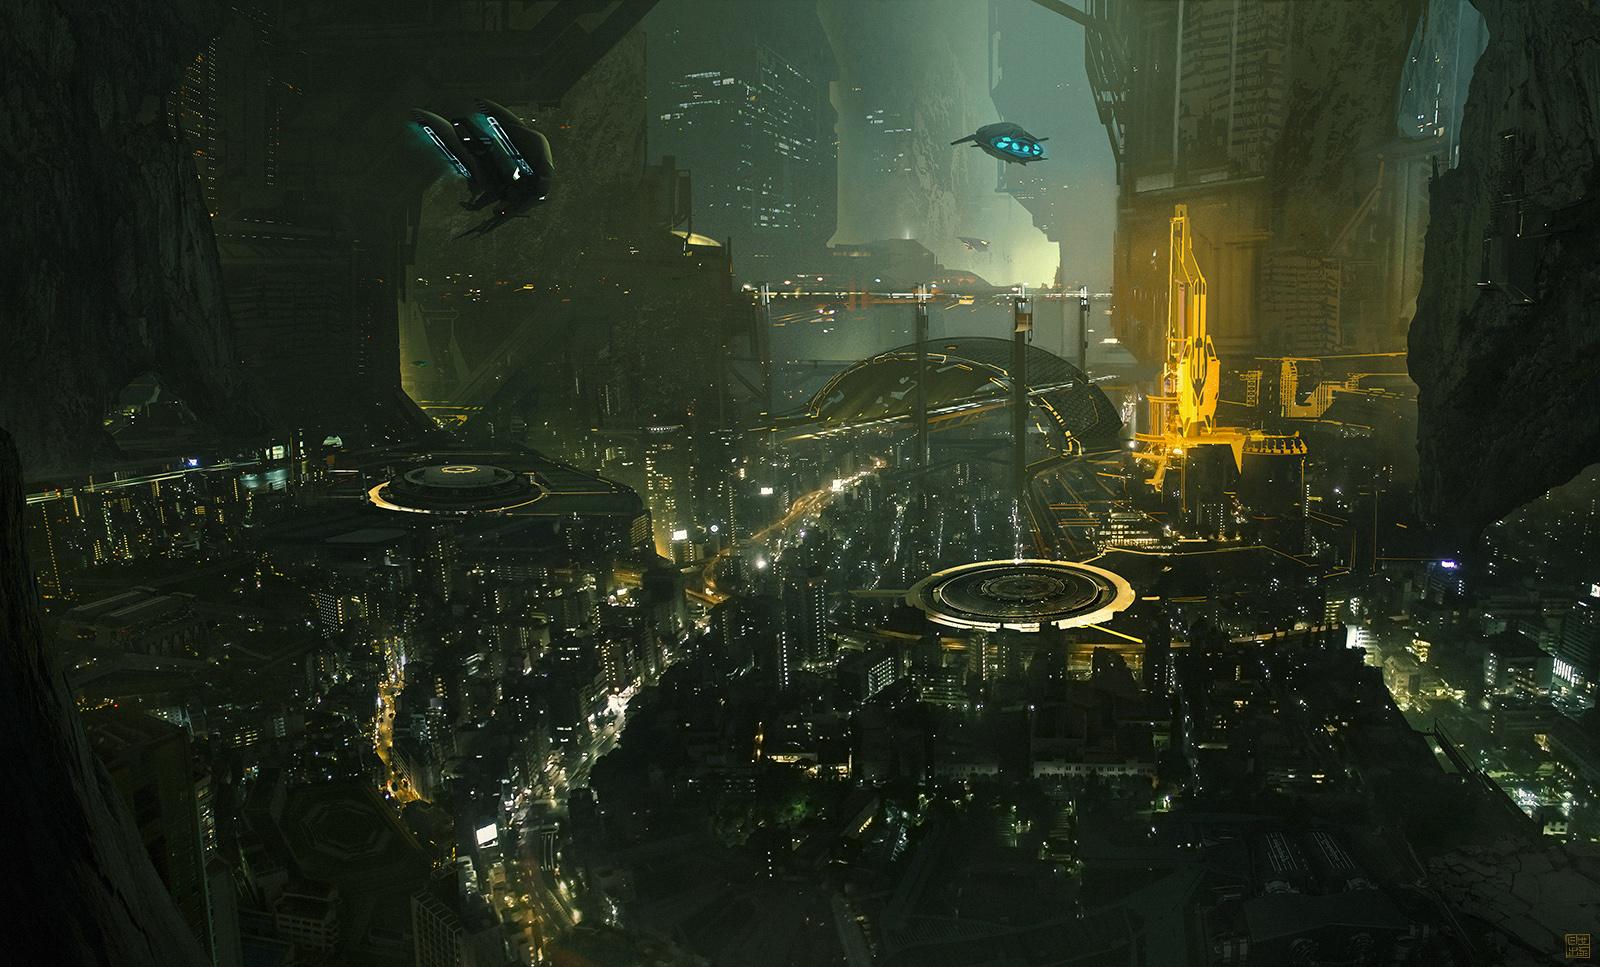 Eclipse Phase - Lunar Cave City